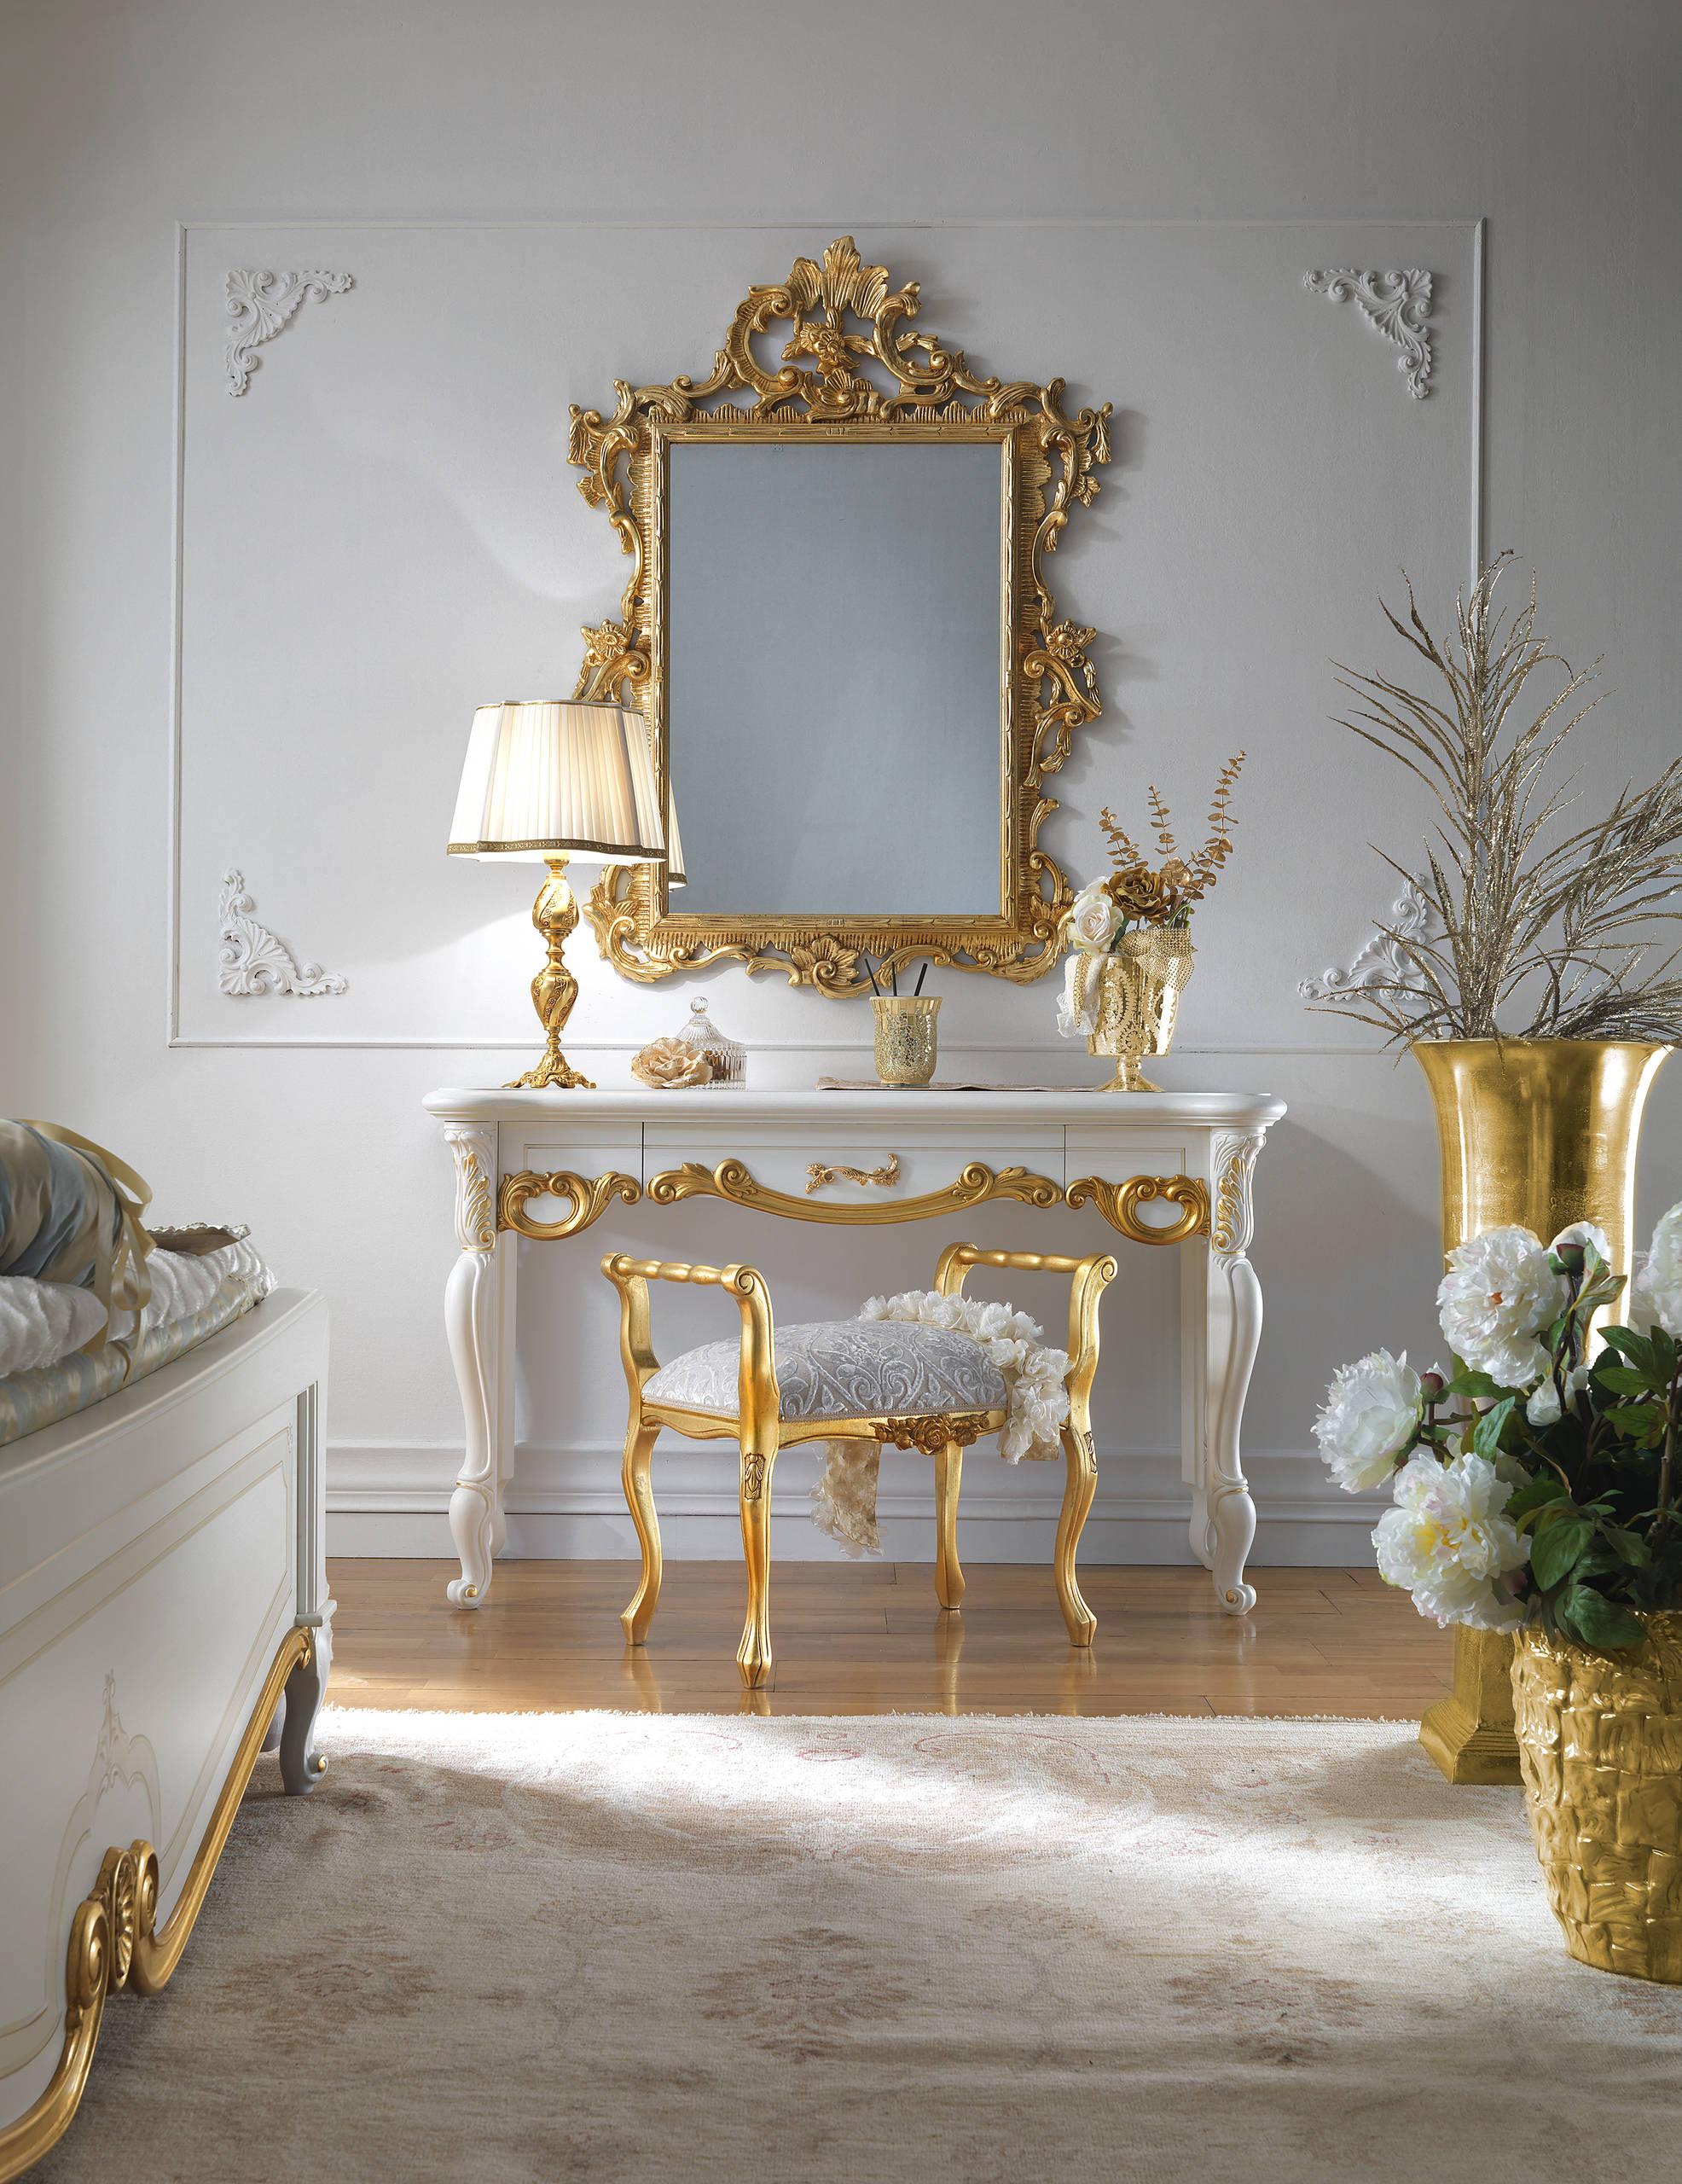 Beauty & The Beast Bedroom Ideas And Photos  Houzz